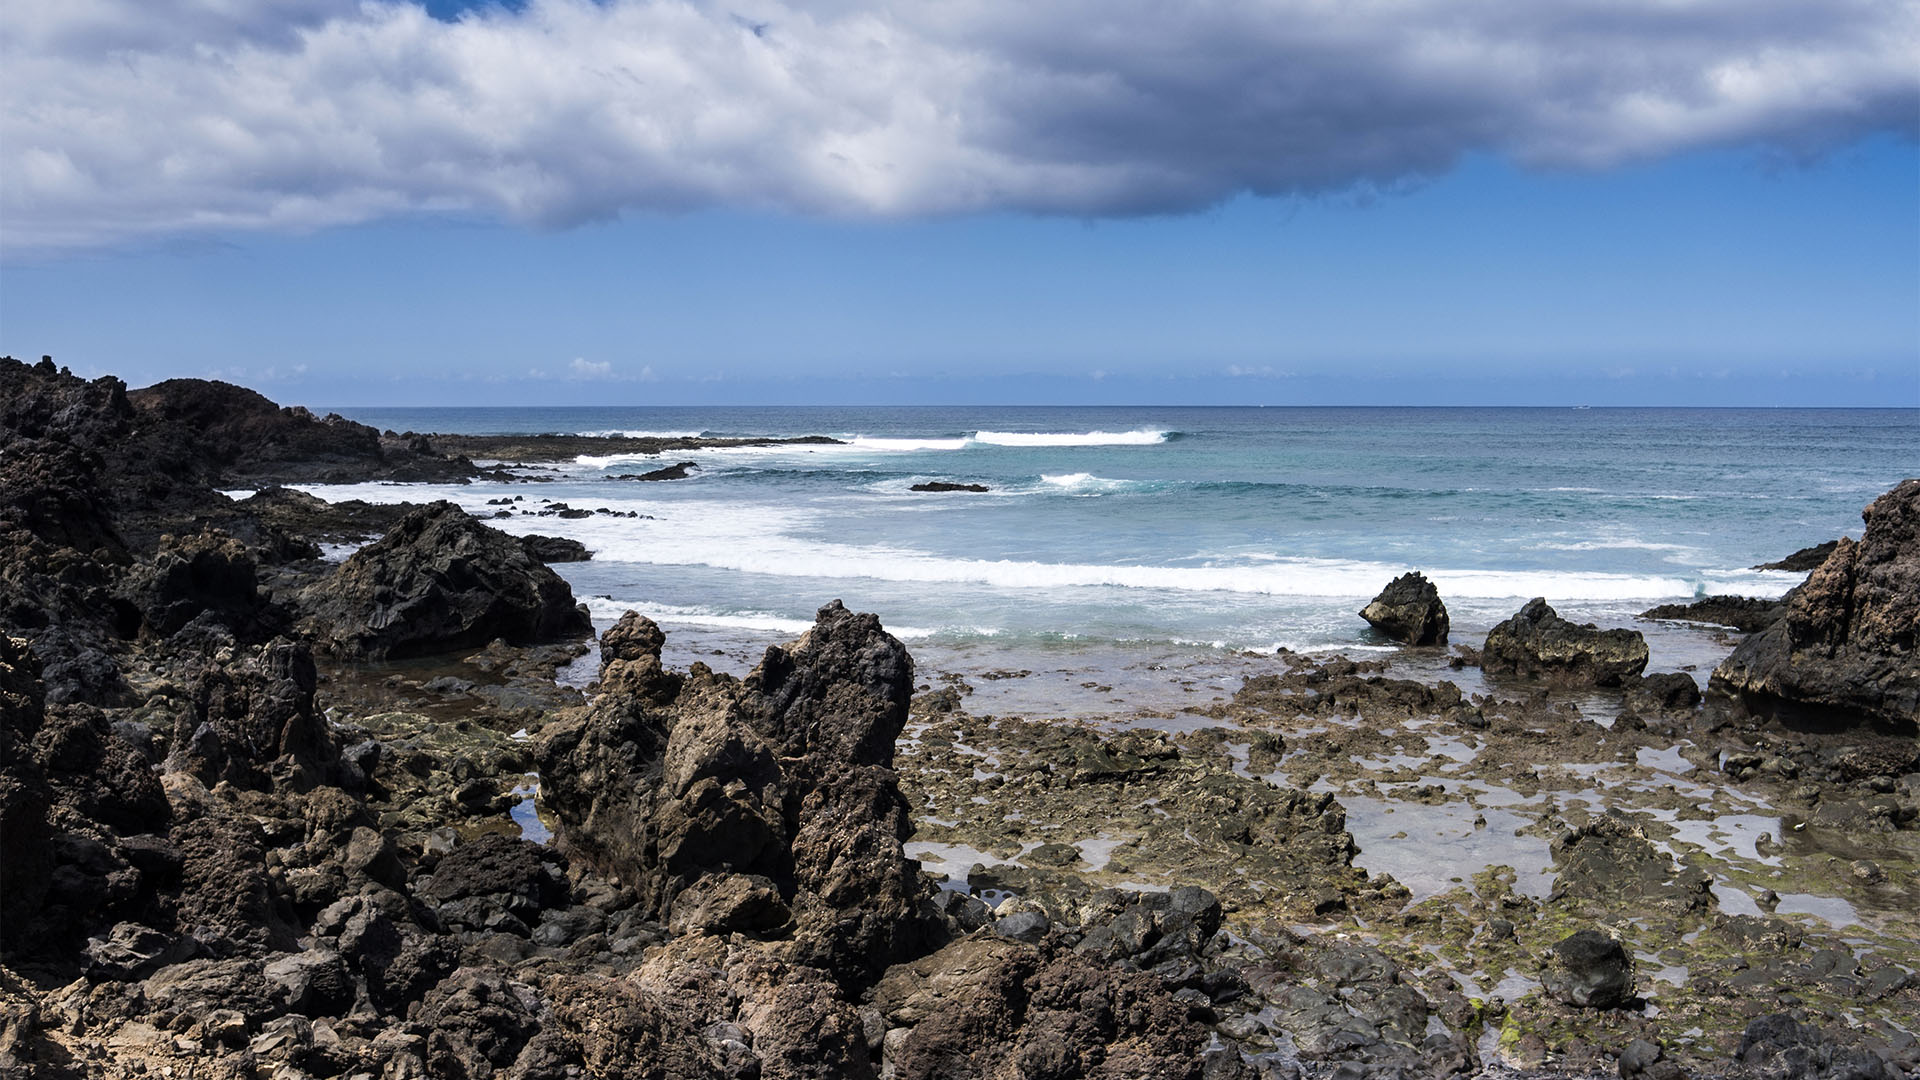 Die Strände Fuerteventuras: Caleta del Vino